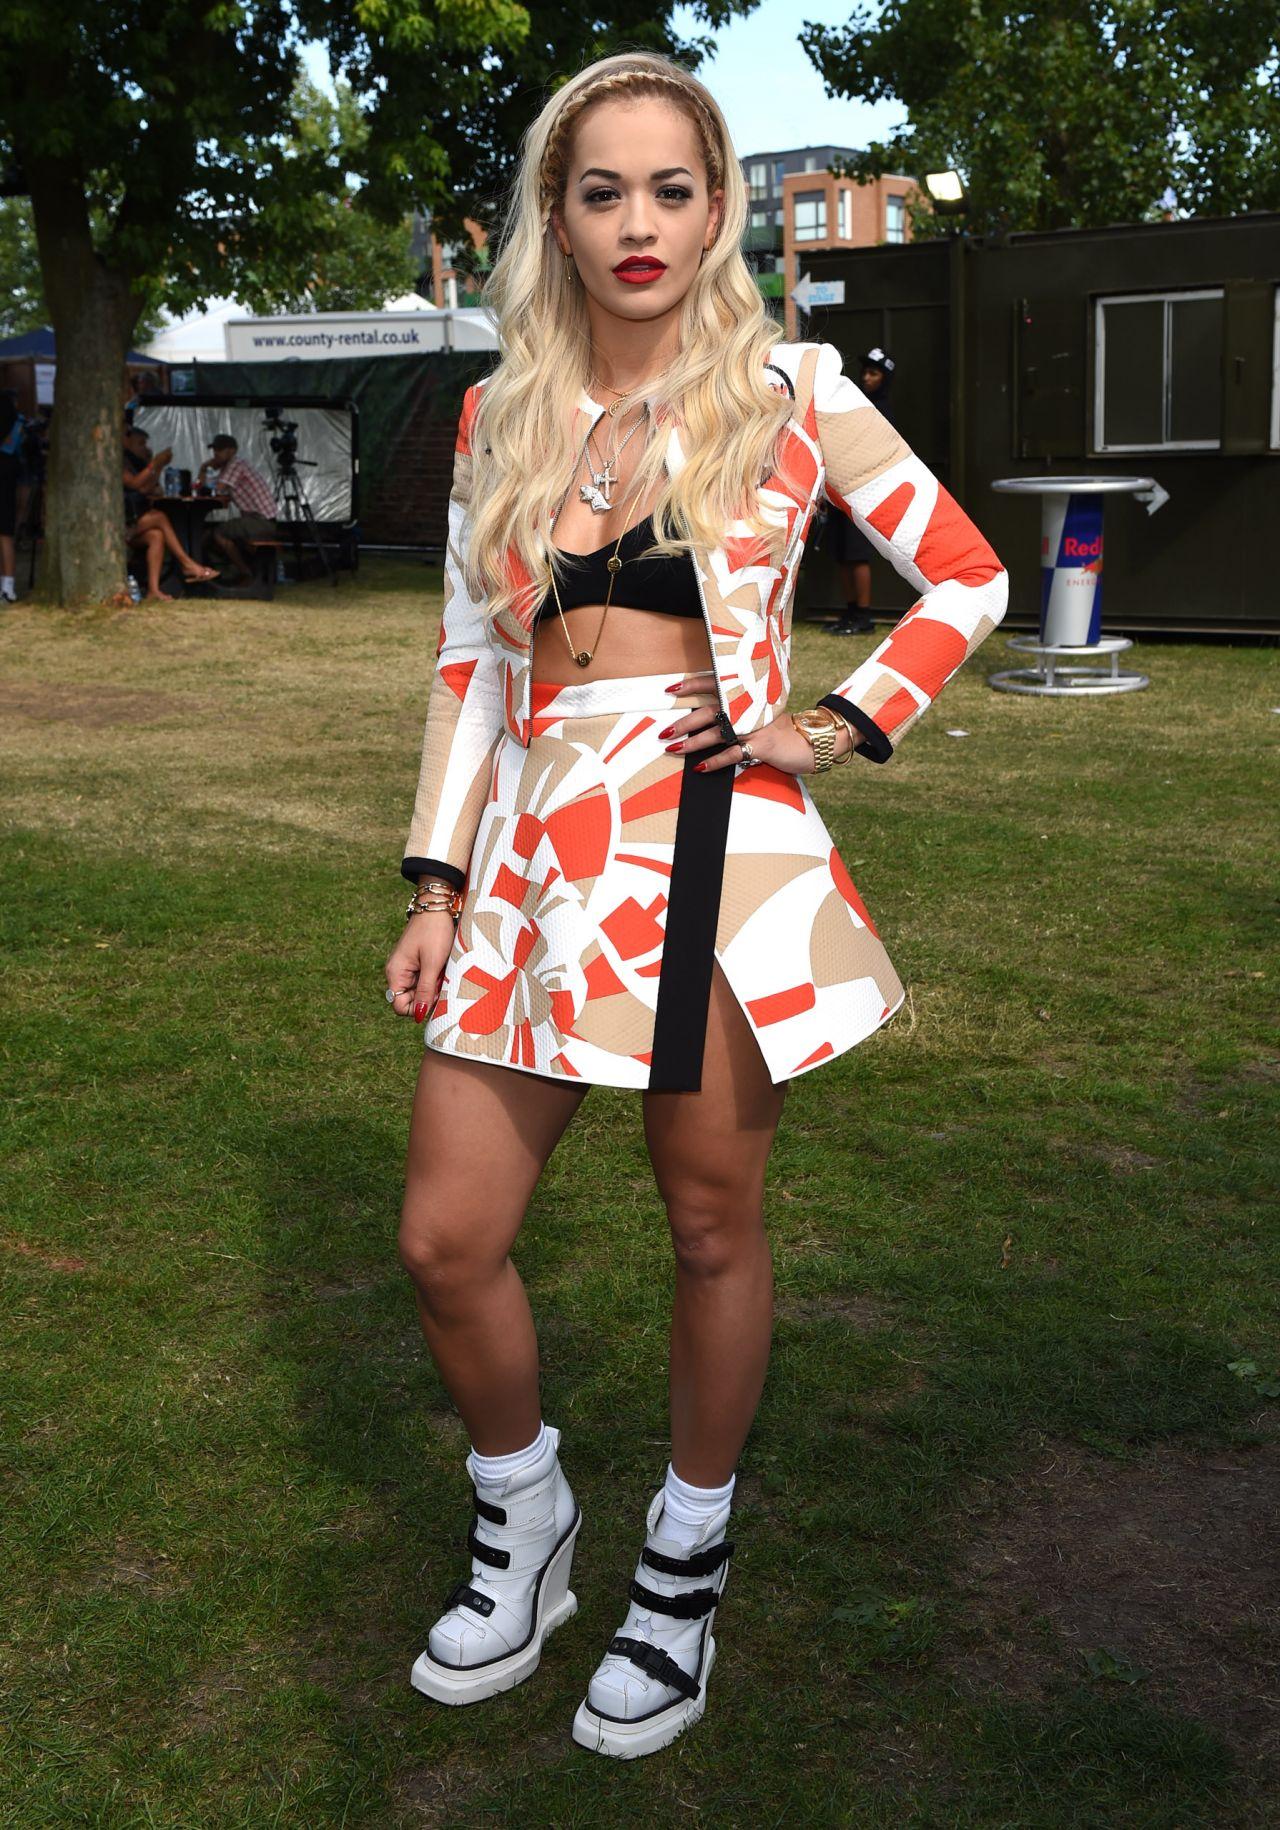 Rita Ora Iggy Azalea Performs At Wireless Festival In Finsbury Park London July 2017